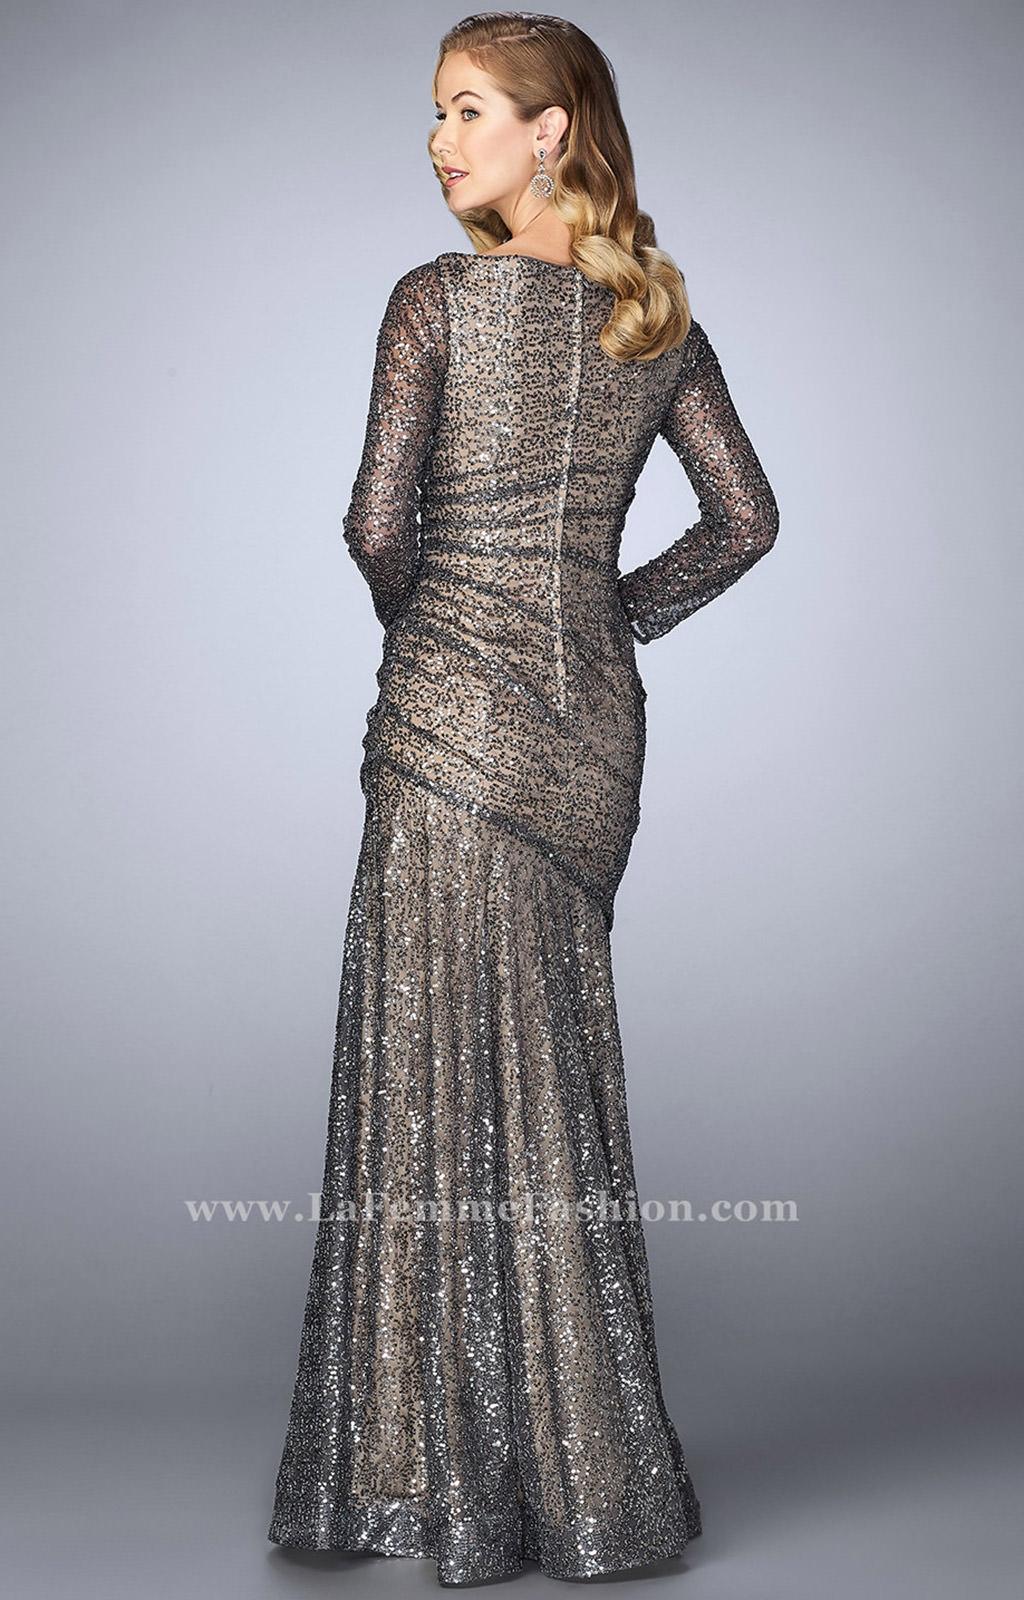 La Femme 24919 Long Sleeve Sequin Dress Prom Dress